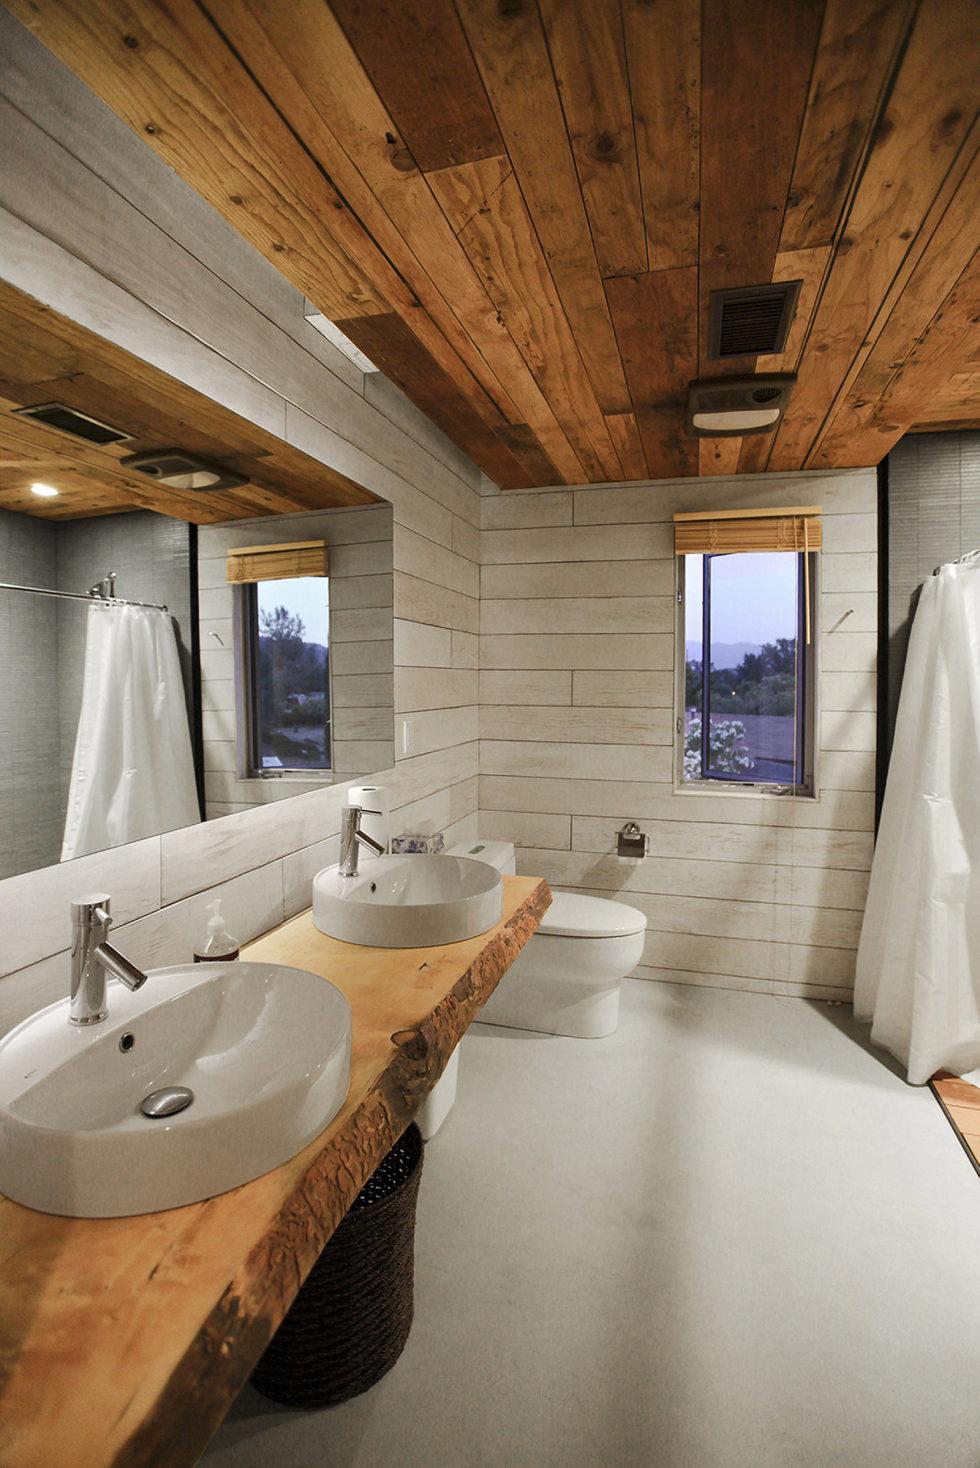 510 Cabin The Country House From Hunter Leggitt Studio In The USA 9